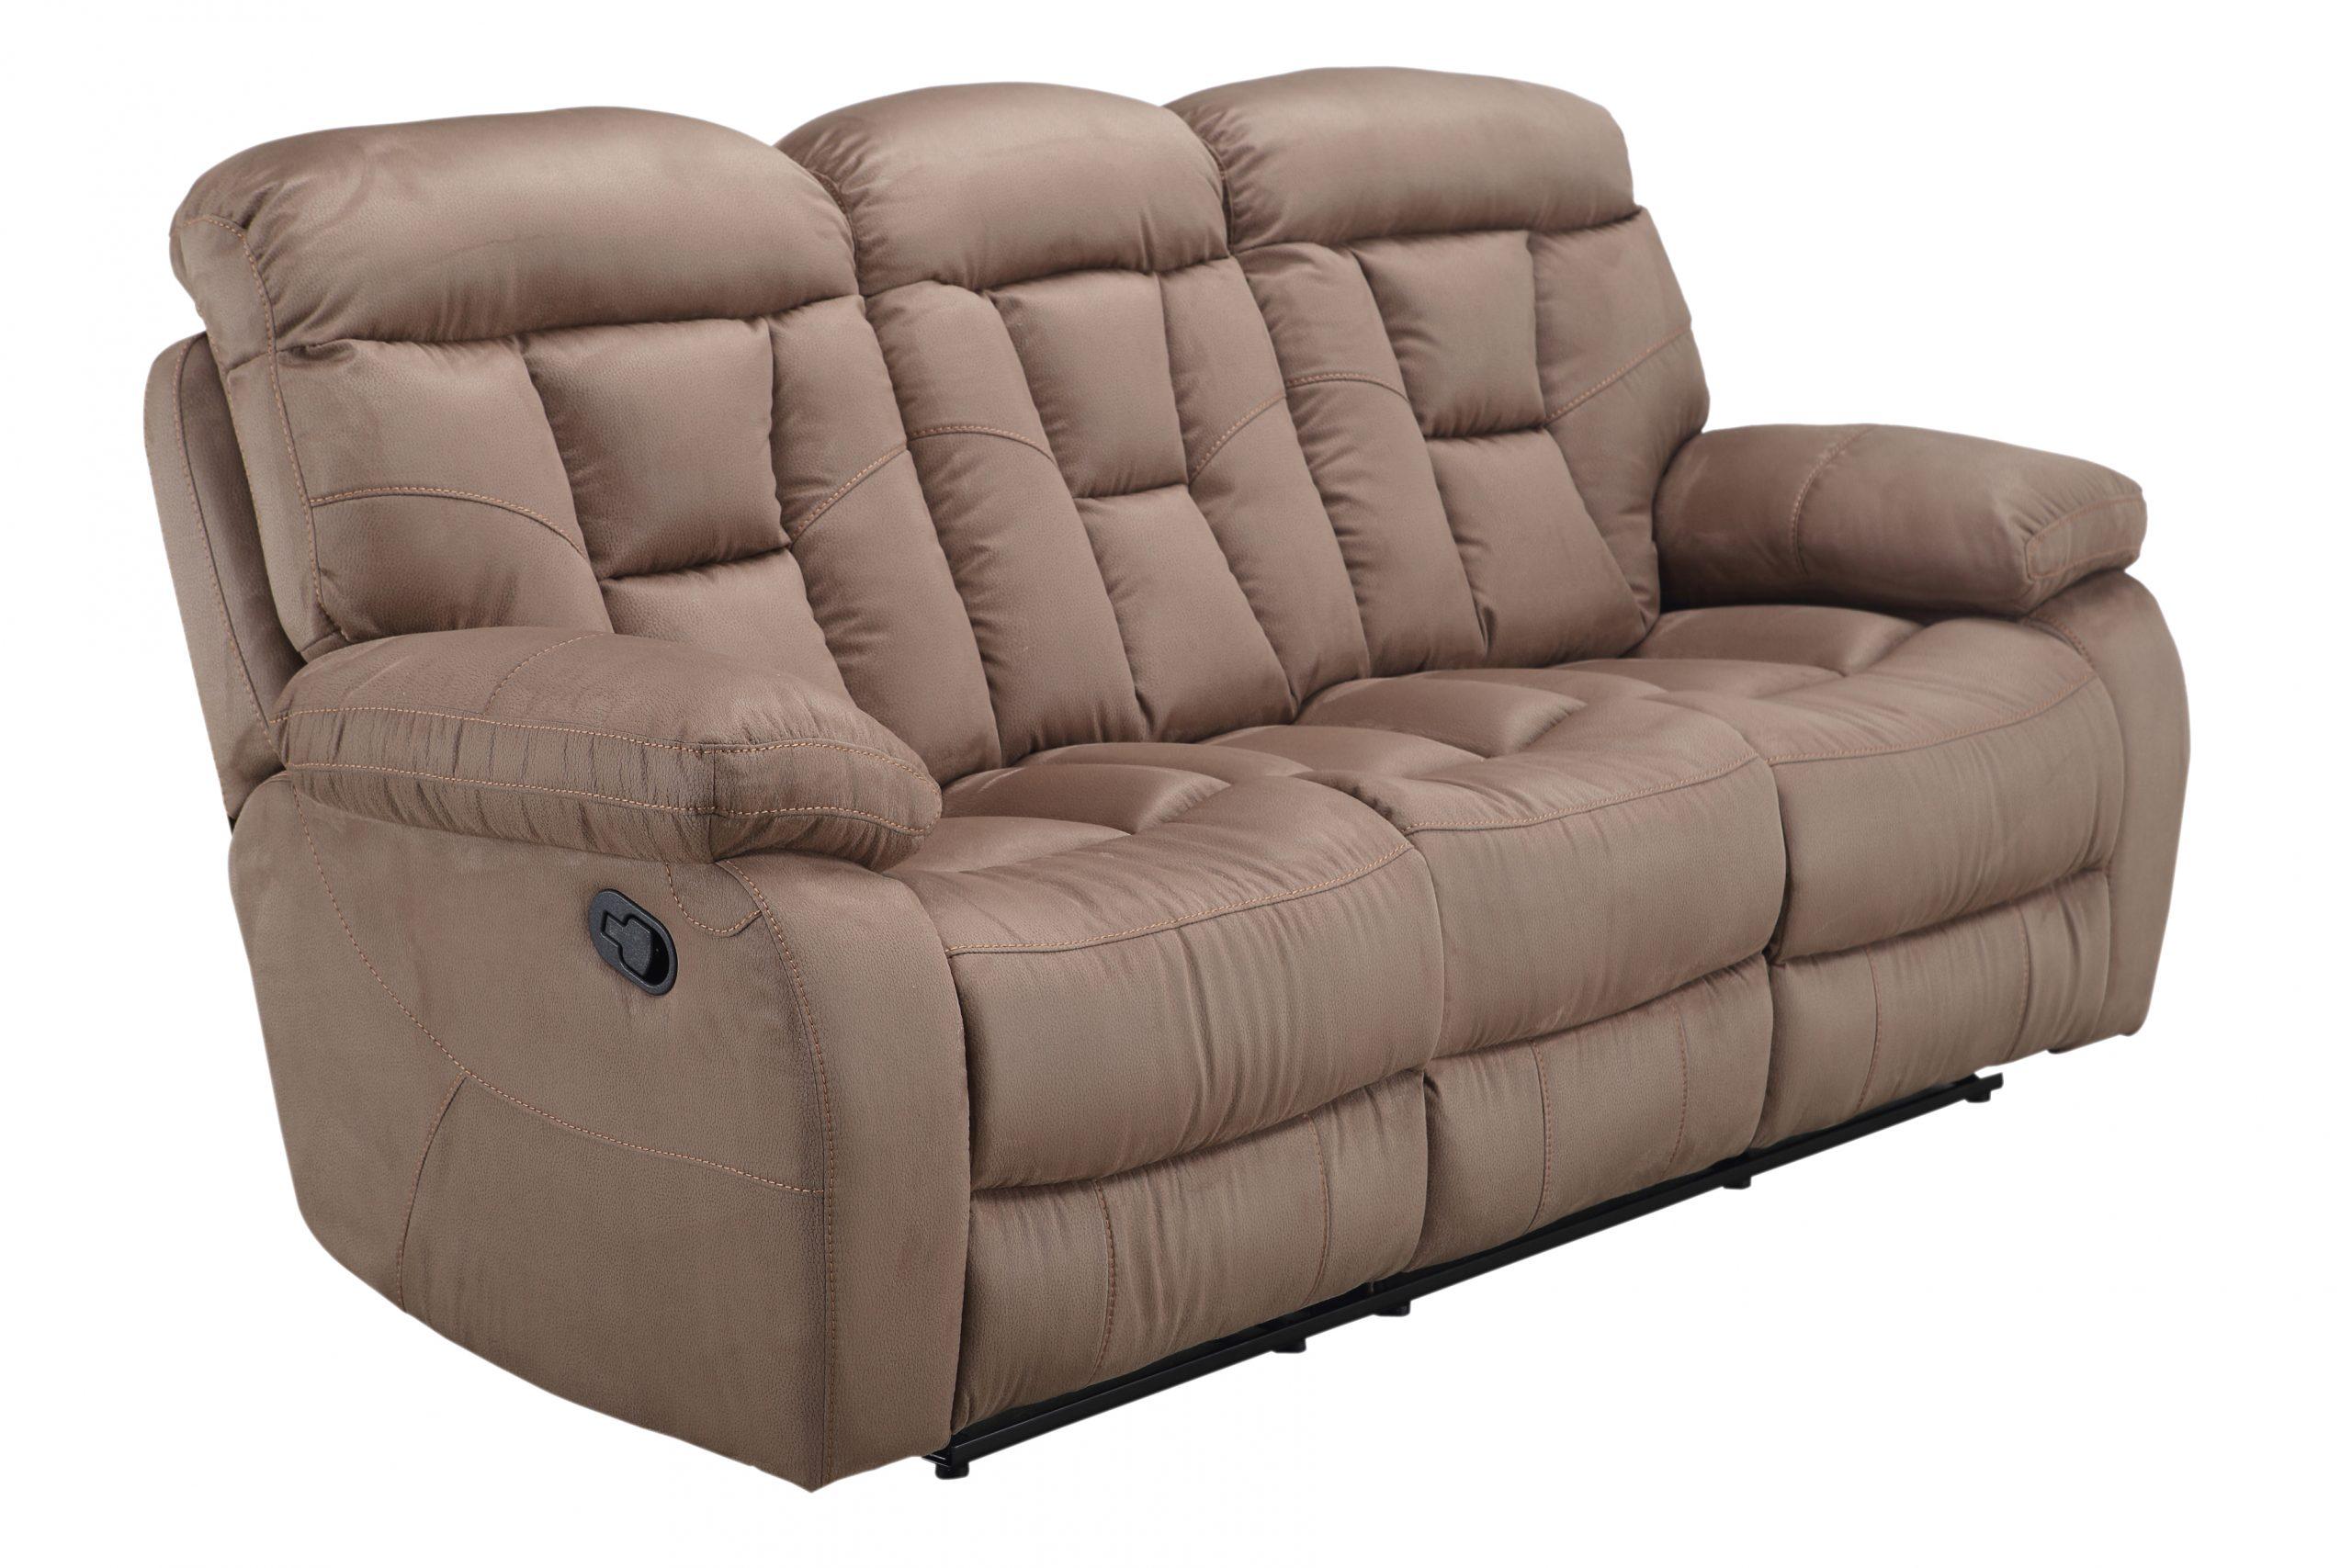 Full Size of 3 Sitzer Sofa Mit Schlaffunktion Leder Couch Ikea Grau Relaxfunktion Elektrisch Recliner Inkl 2 Fach Fm 394 Von Femo Chesterfield Rattan Boxspring Leinen Big Sofa 3 Sitzer Sofa